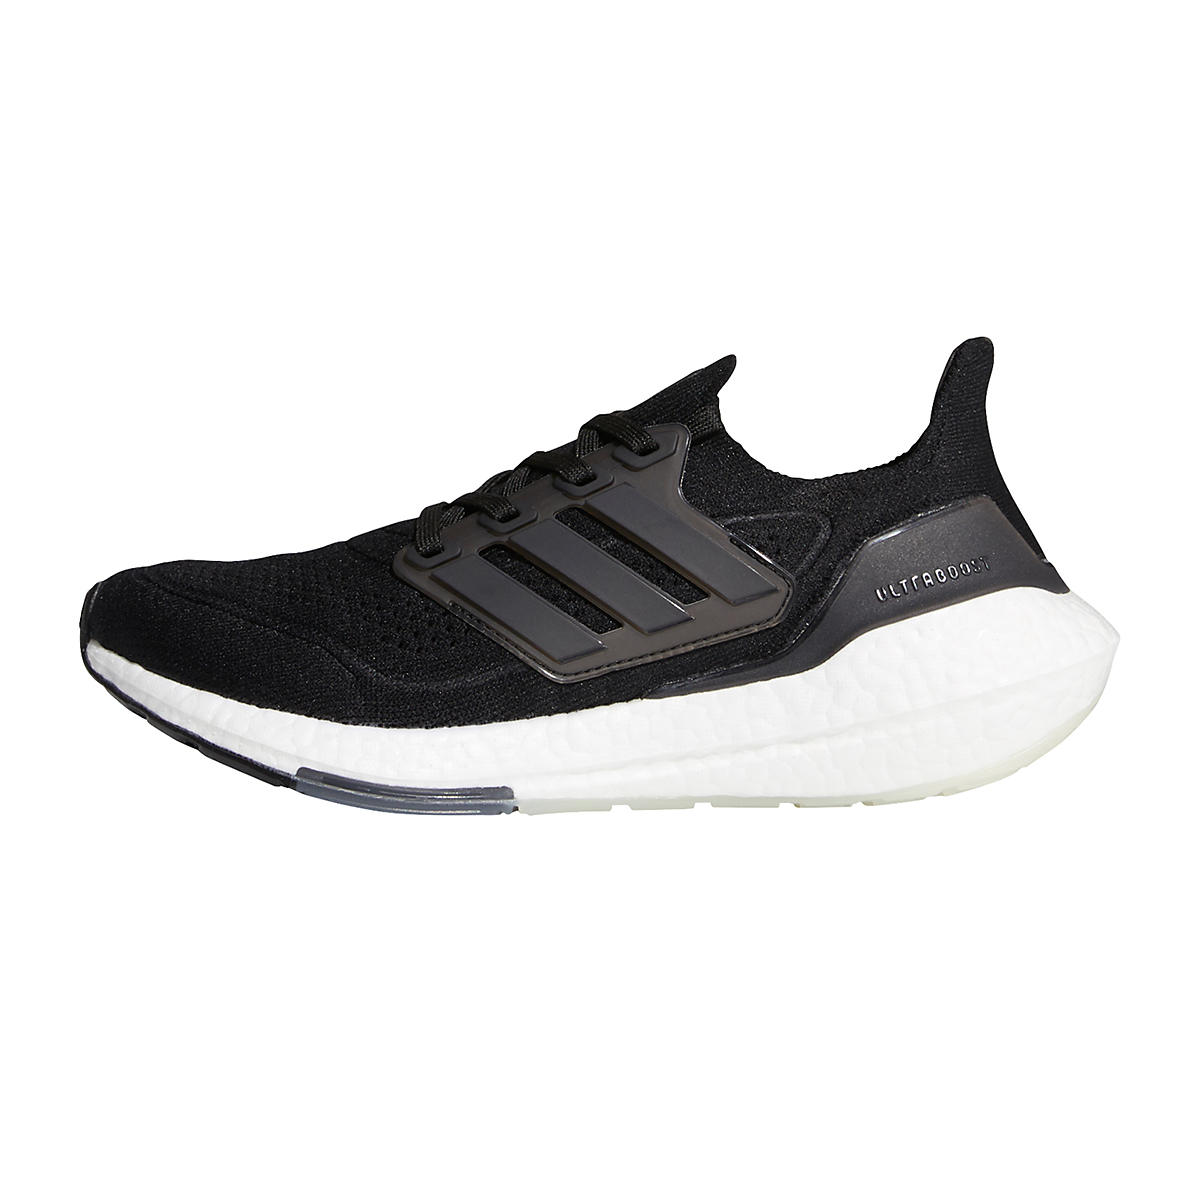 Women's Adidas Ultraboost 21 Running Shoe - Color: Core Black/Grey - Size: 5 - Width: Regular, Core Black/Grey, large, image 2